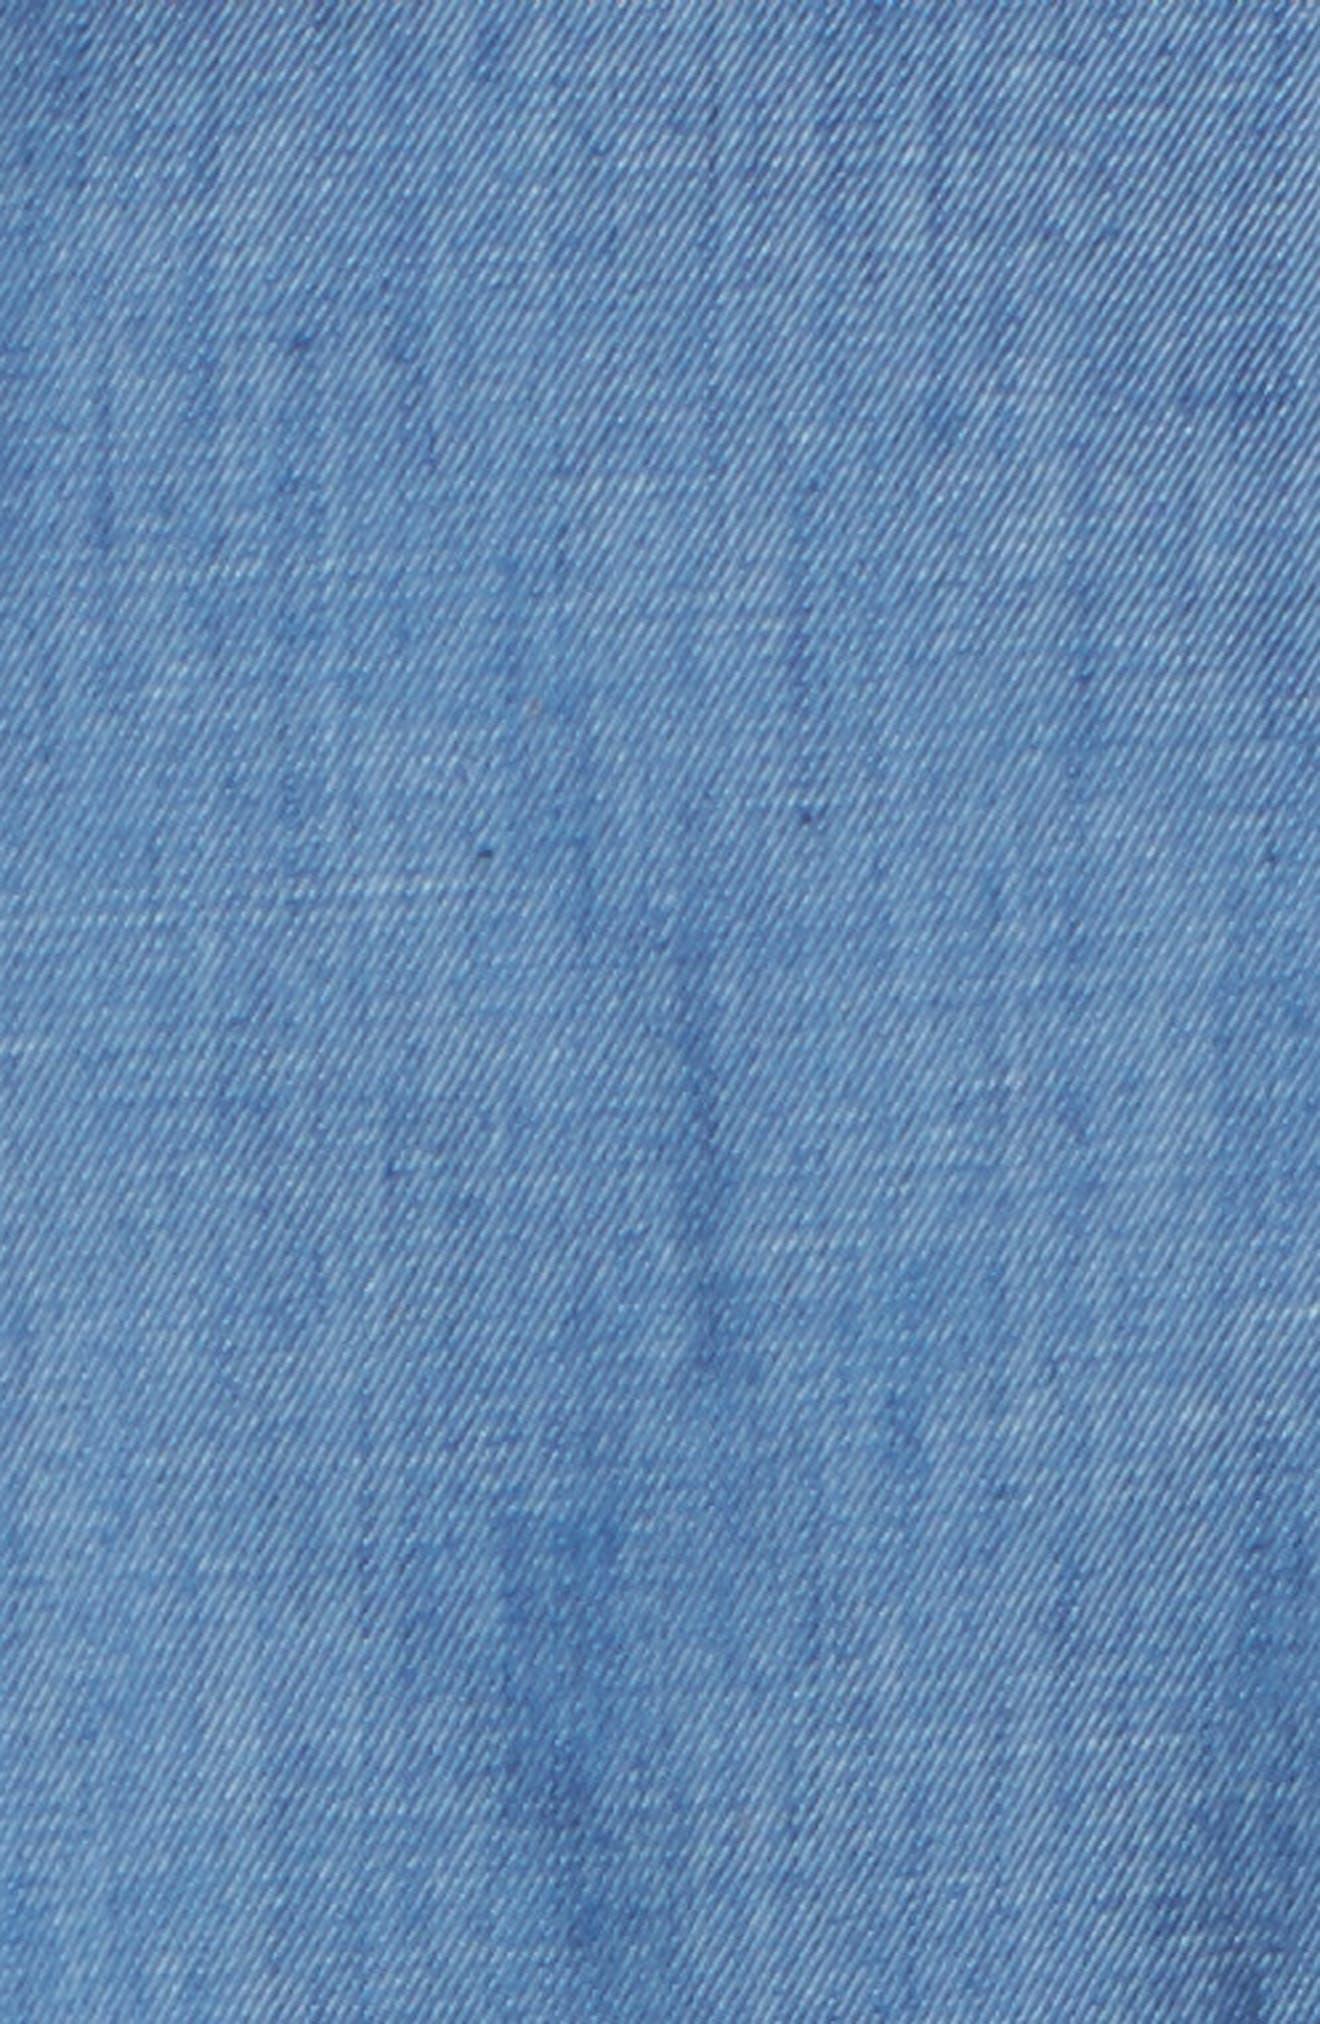 Ruffle Denim Wrap Dress,                             Alternate thumbnail 5, color,                             405